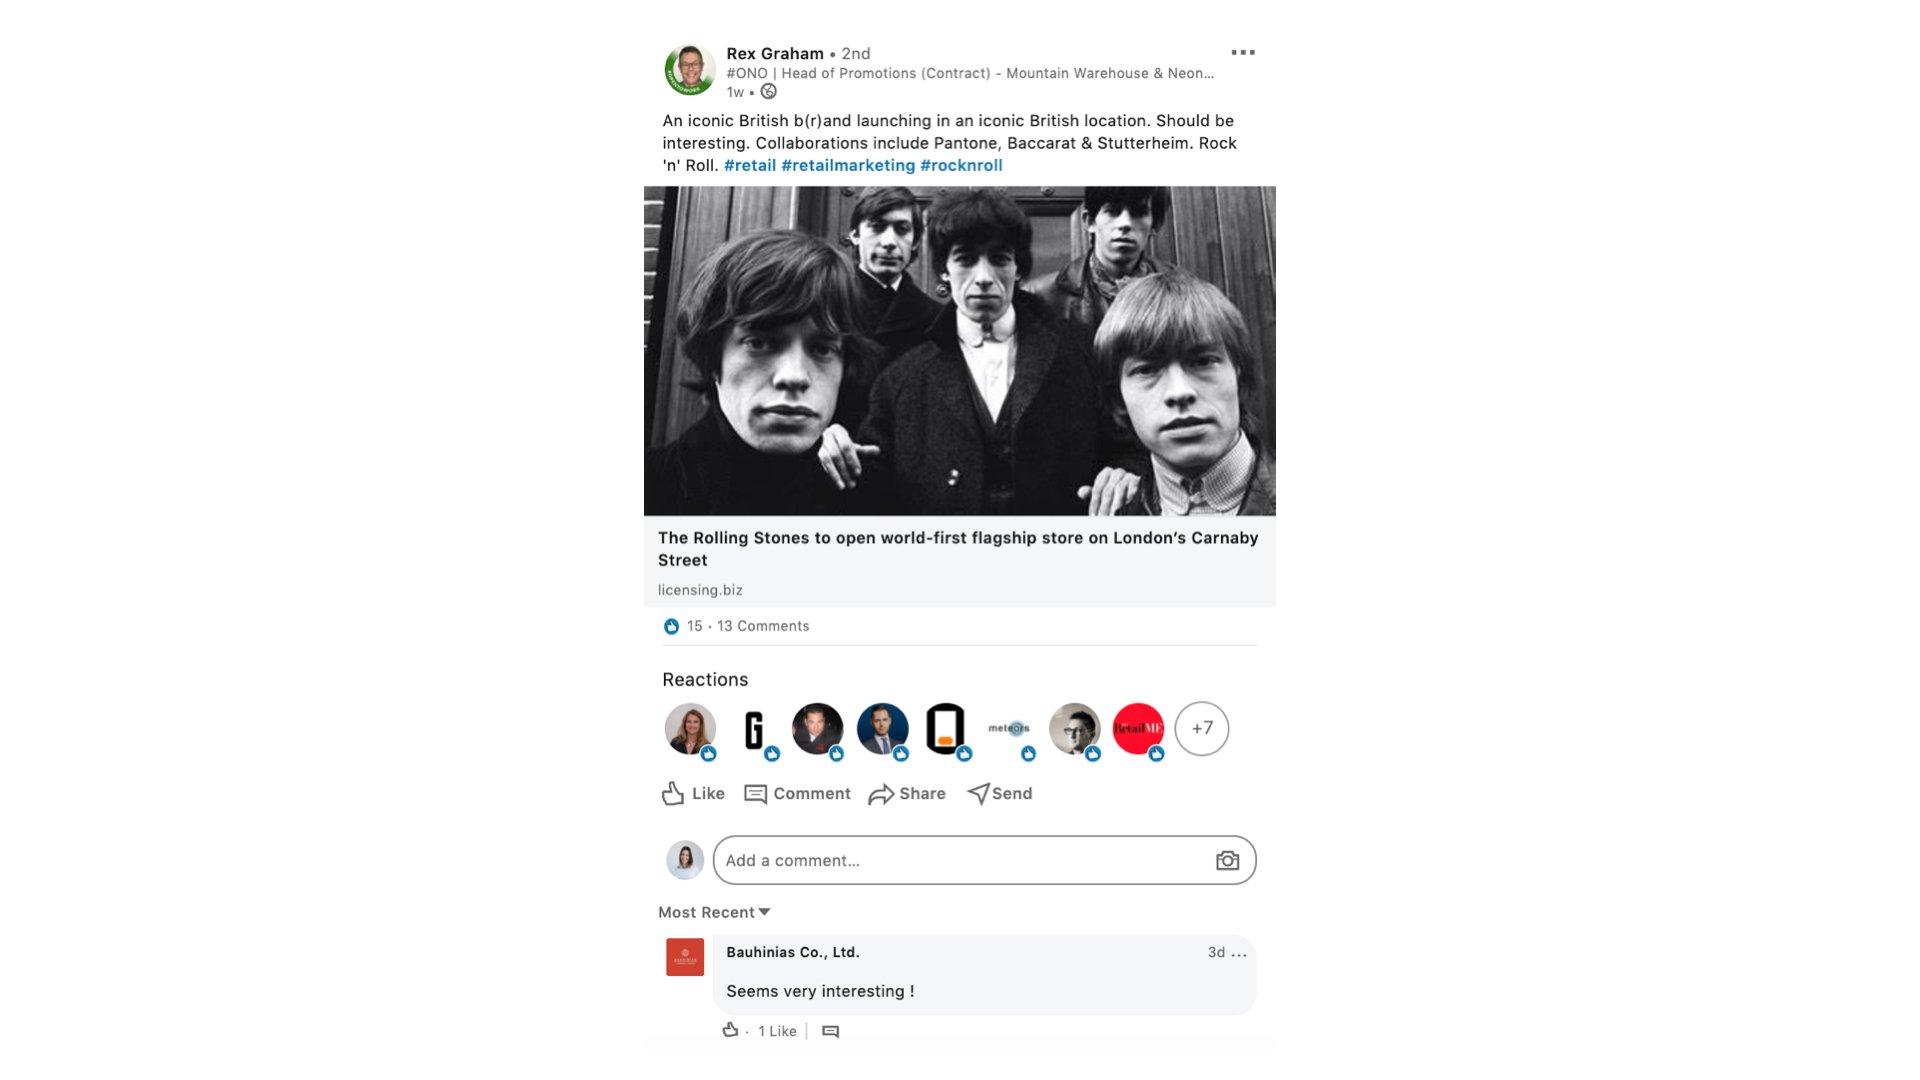 Rolling Stones Brand